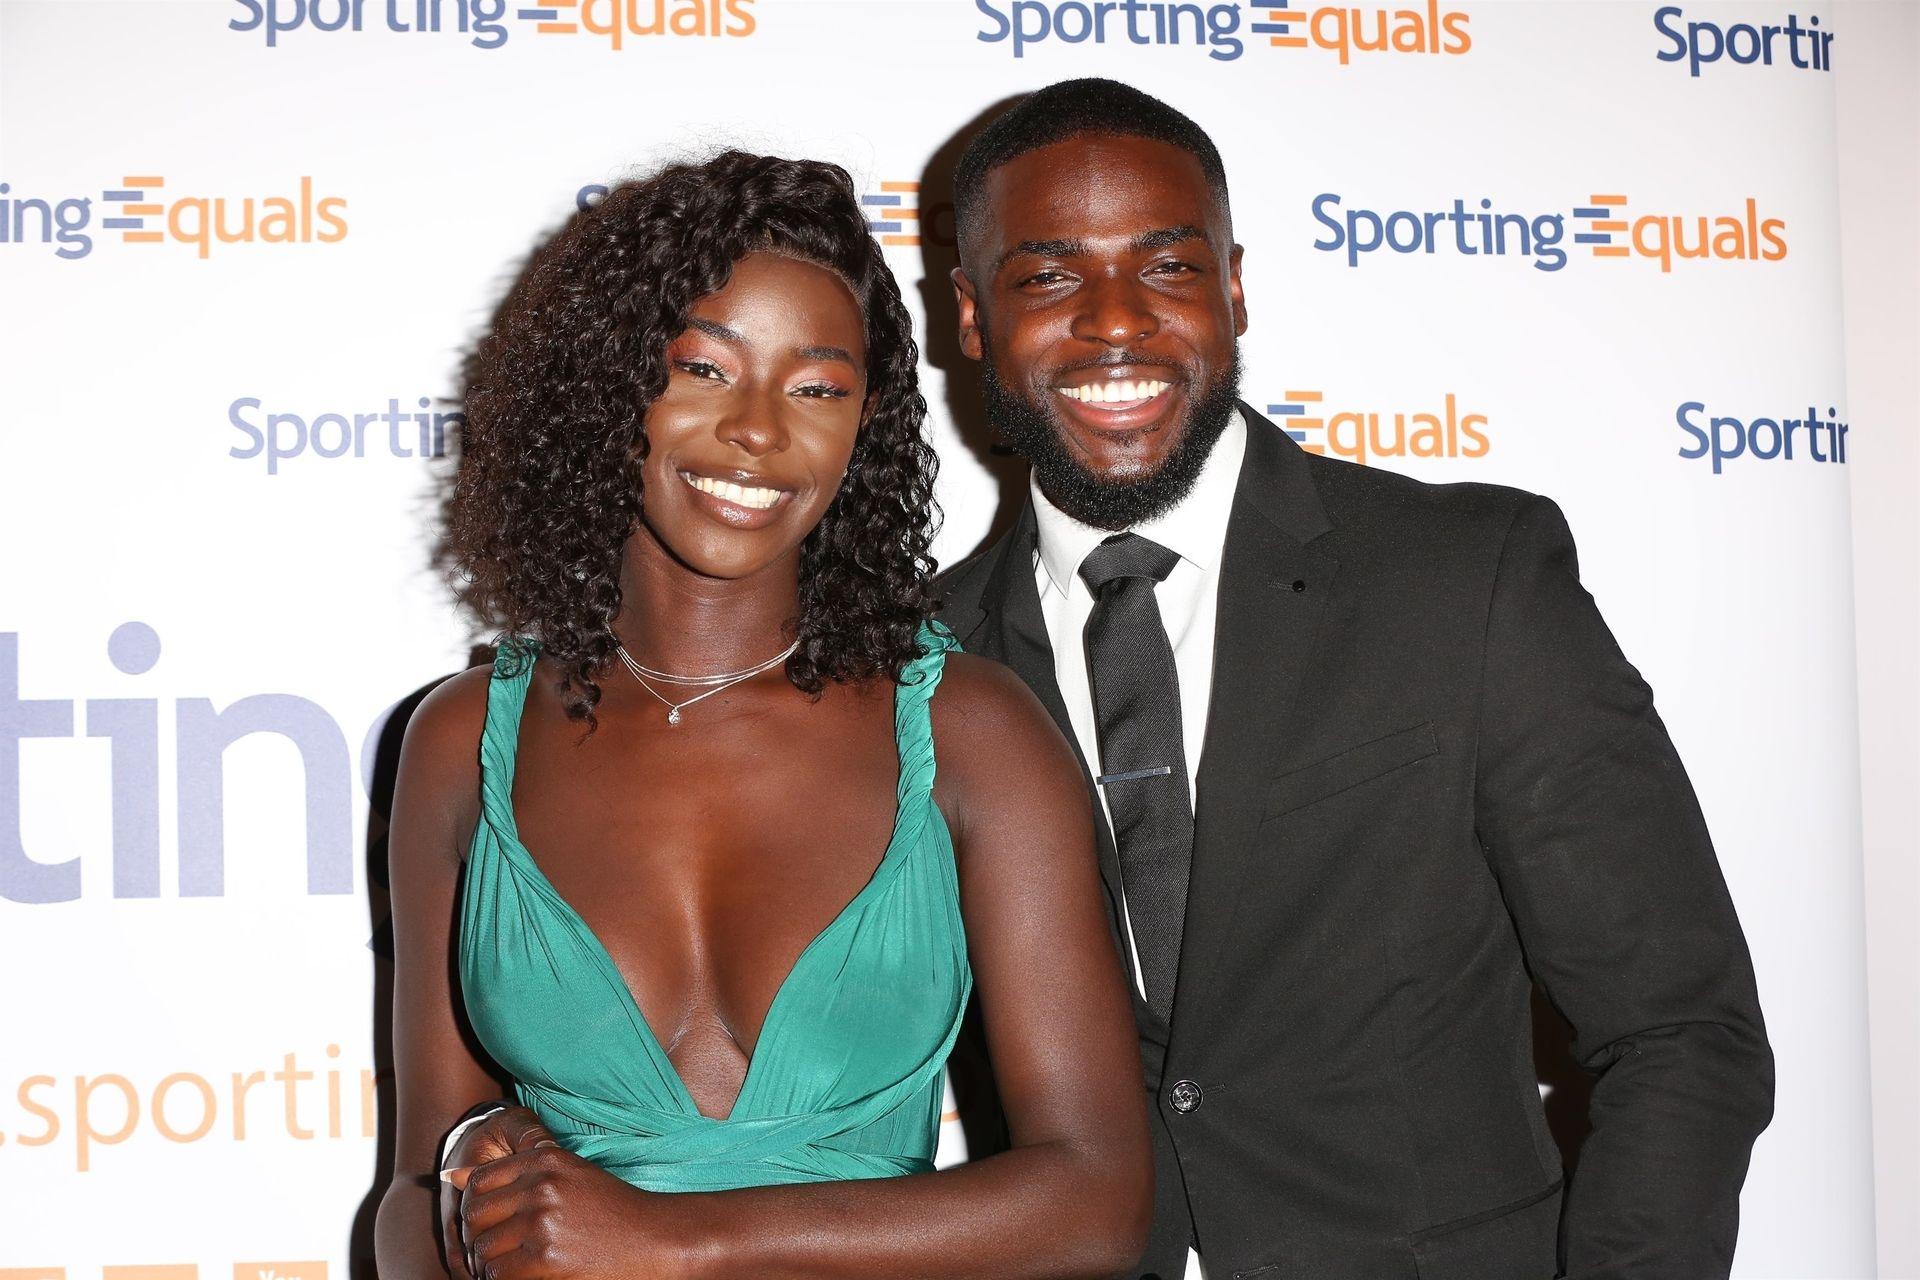 Mike Boateng & Priscilla Anyabu Are Seen At British Ethnic Diversity Sports Awards 0115